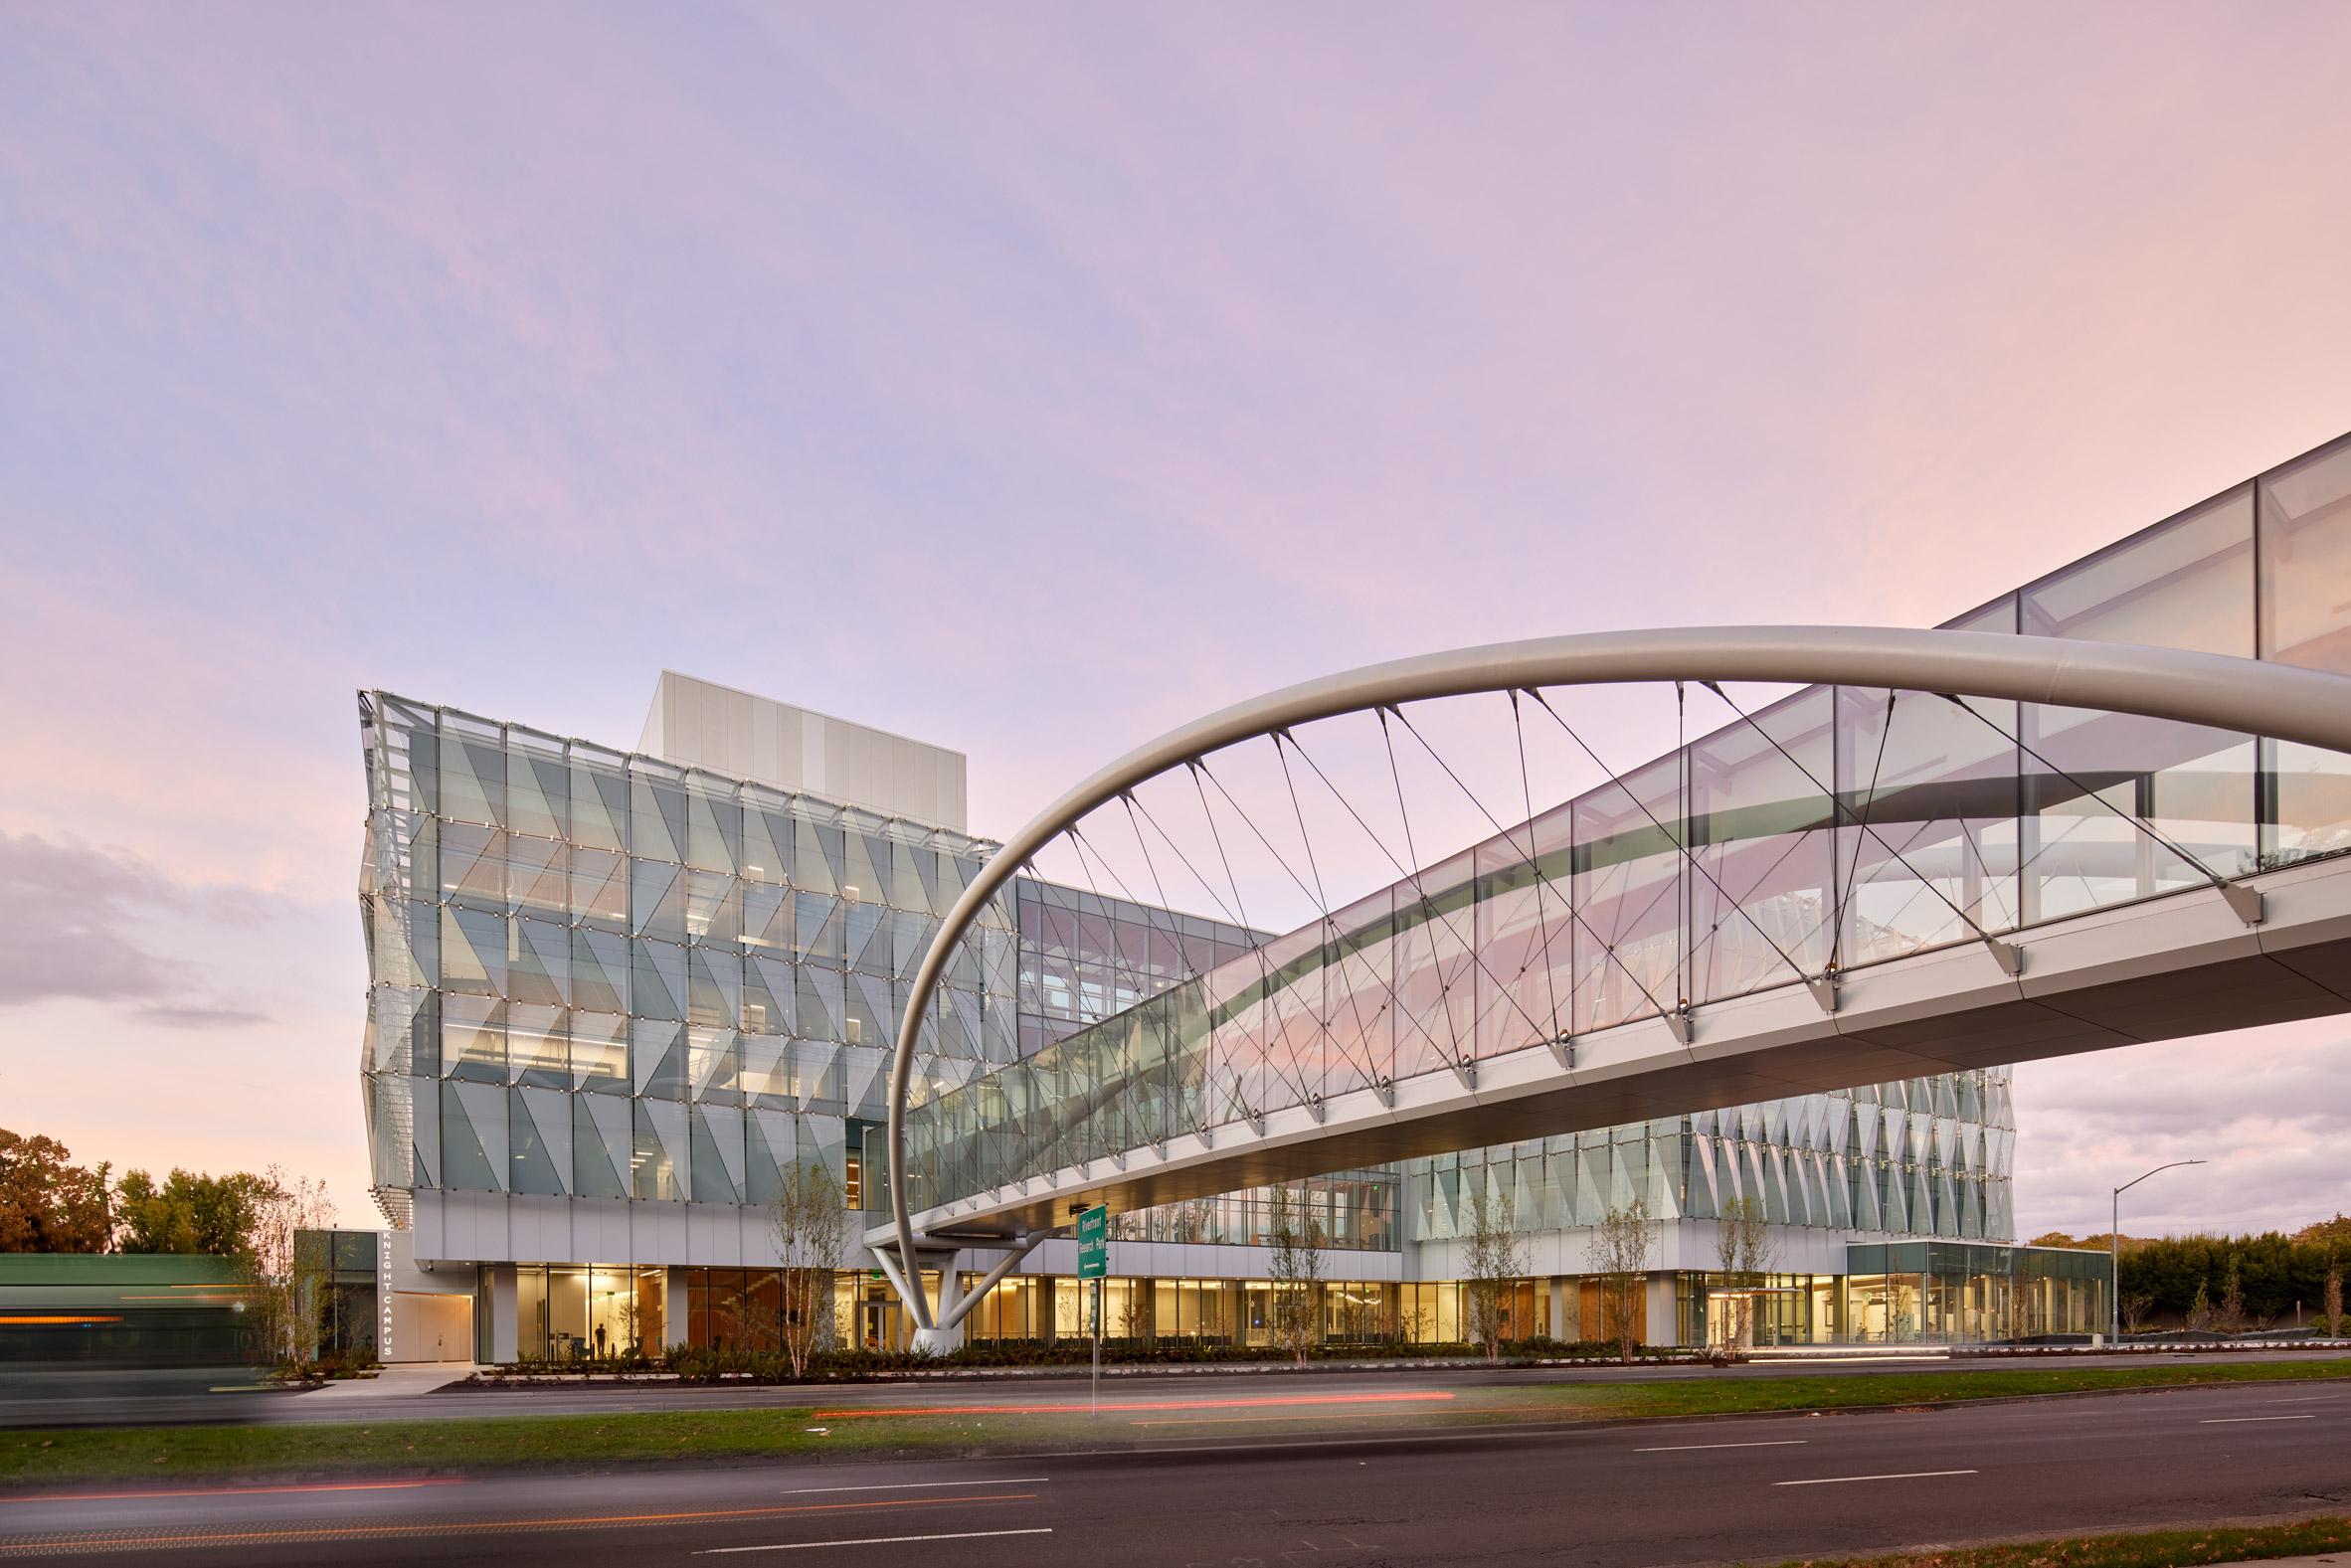 Pedestrian bridge of Knight Center university facility in the USA